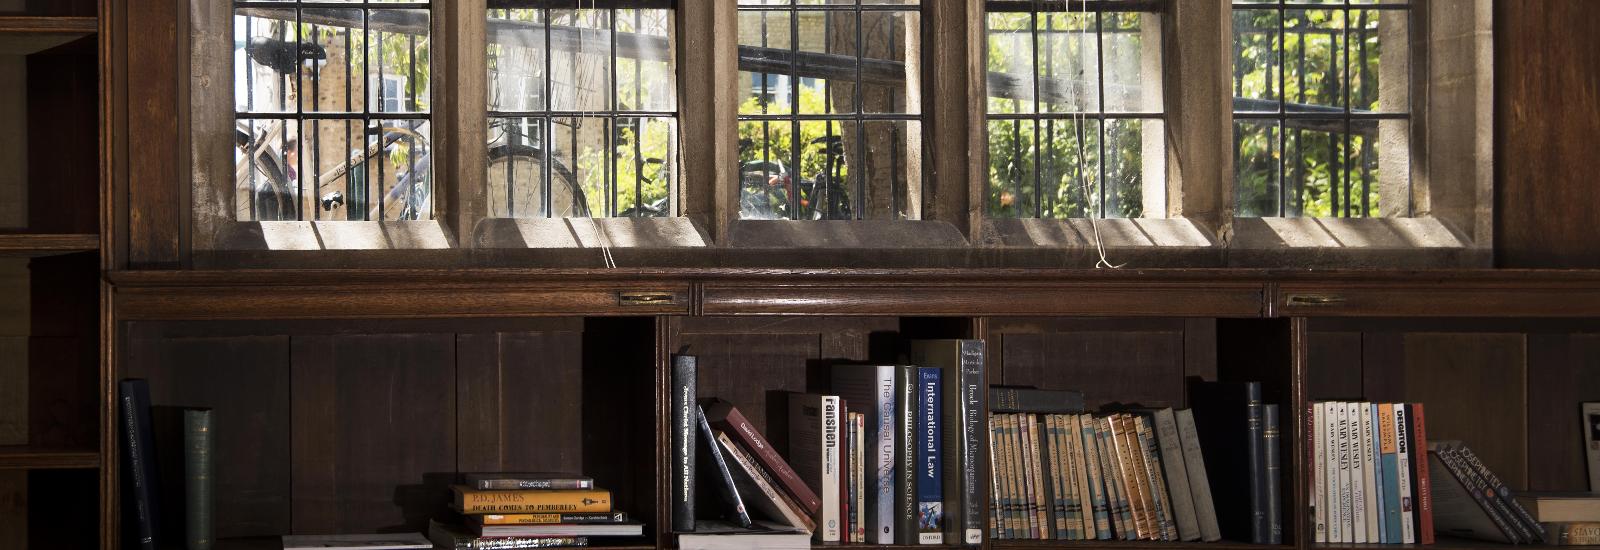 Book shelves in Kathleen Major Library, St Hilda's College